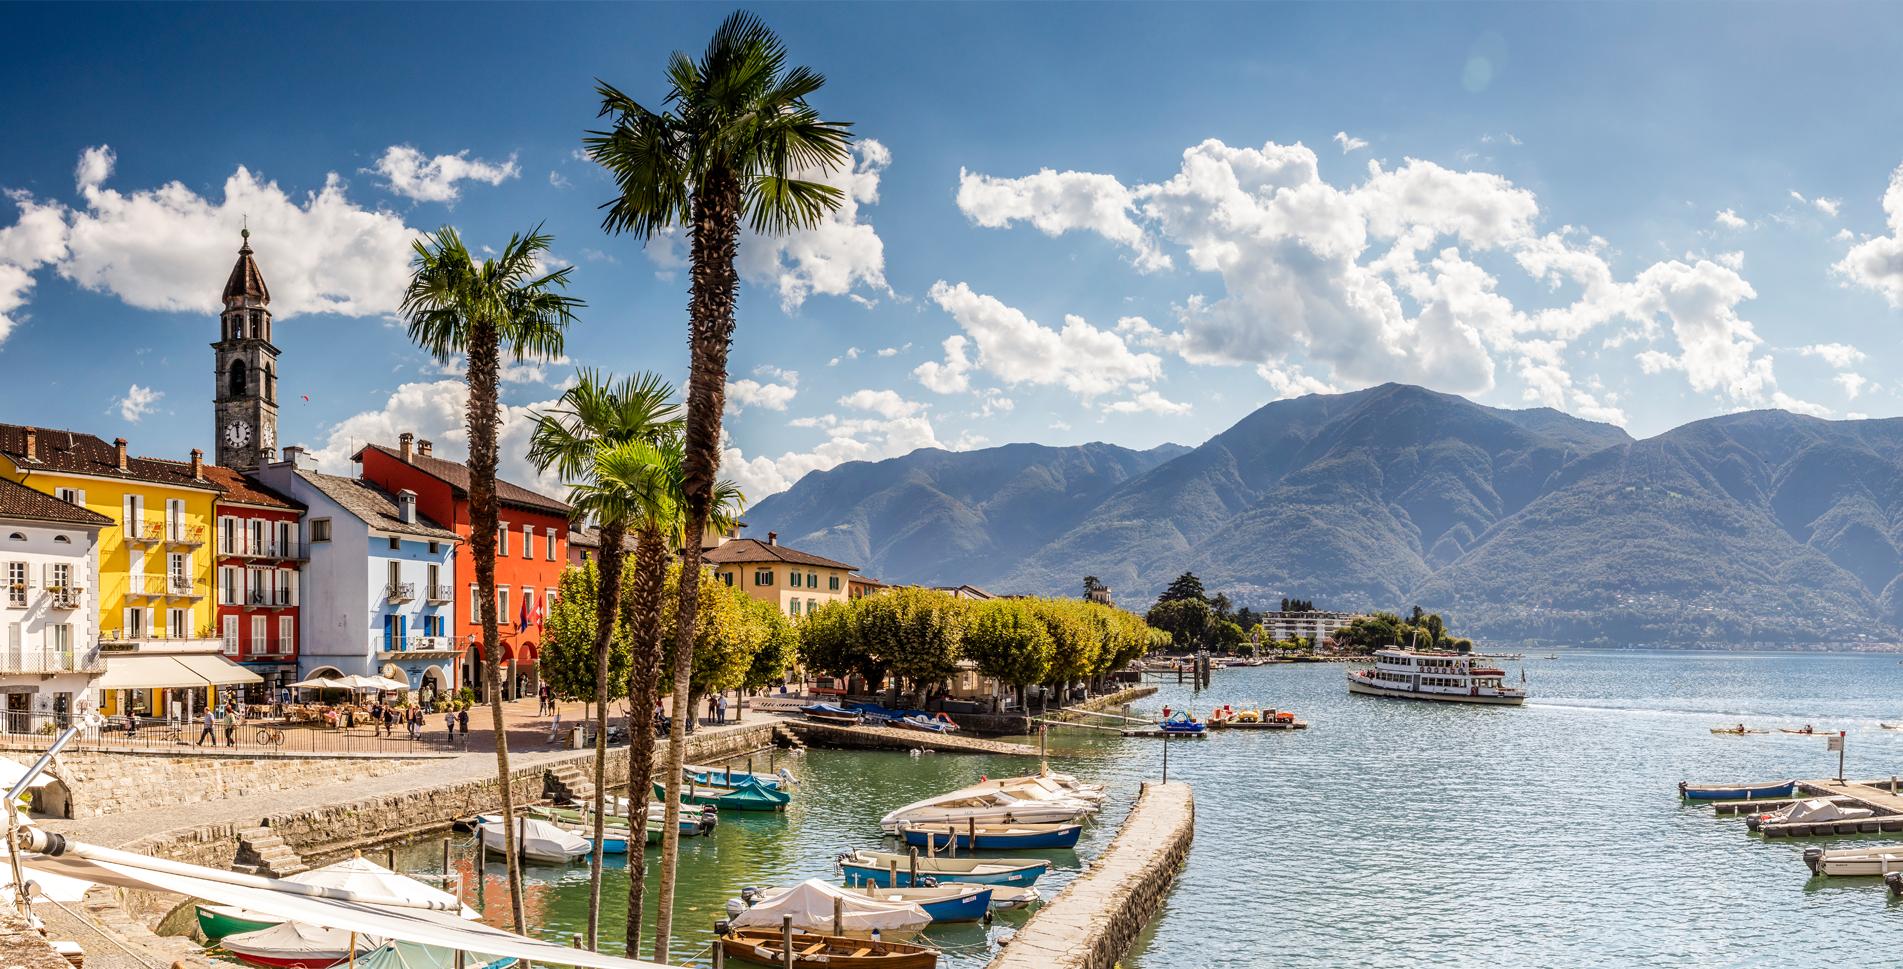 Wanderung auf dem Panoramaweg von Tenero am Ufer des Lago Maggiore entlang via Minusio, Muralto, Locarno nach Ascona